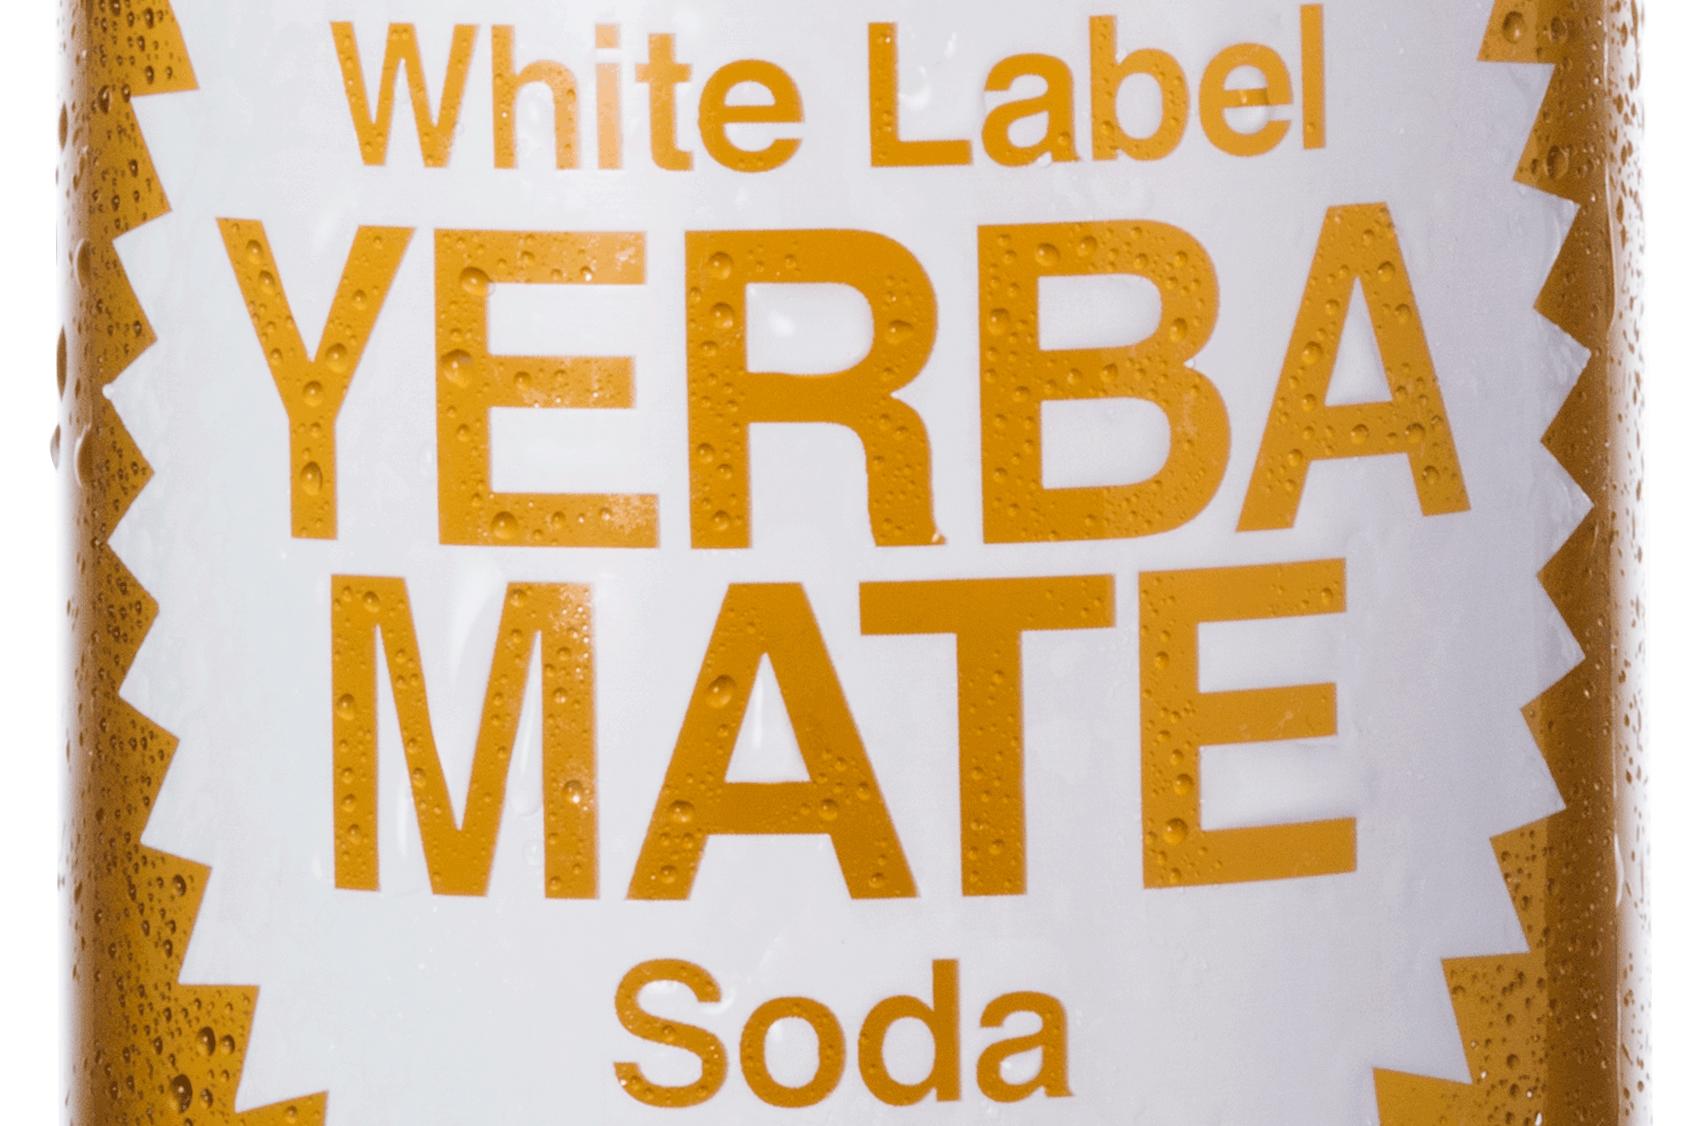 Yerba Mate Social: Octo Octa + Lloydski